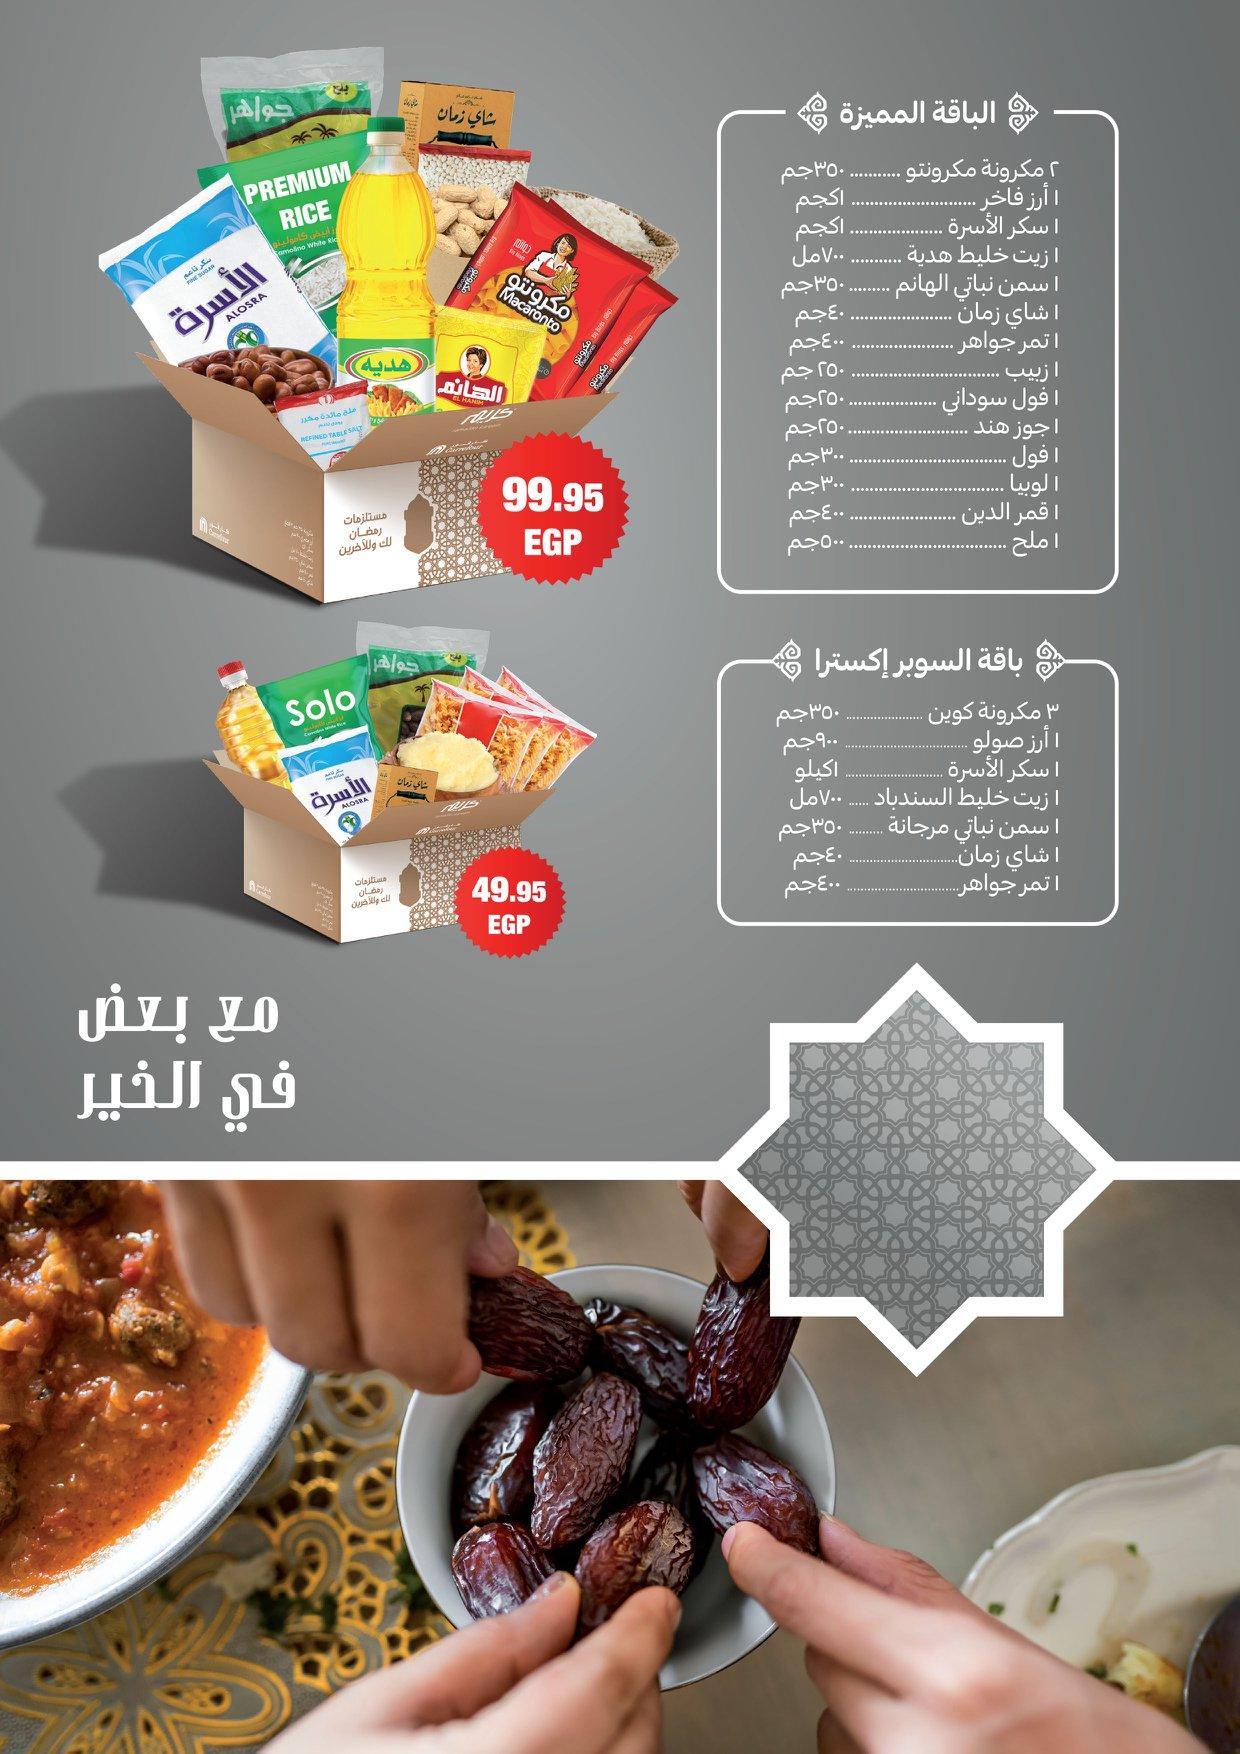 عروض كرتونة رمضان 2021 فى كارفور مصر